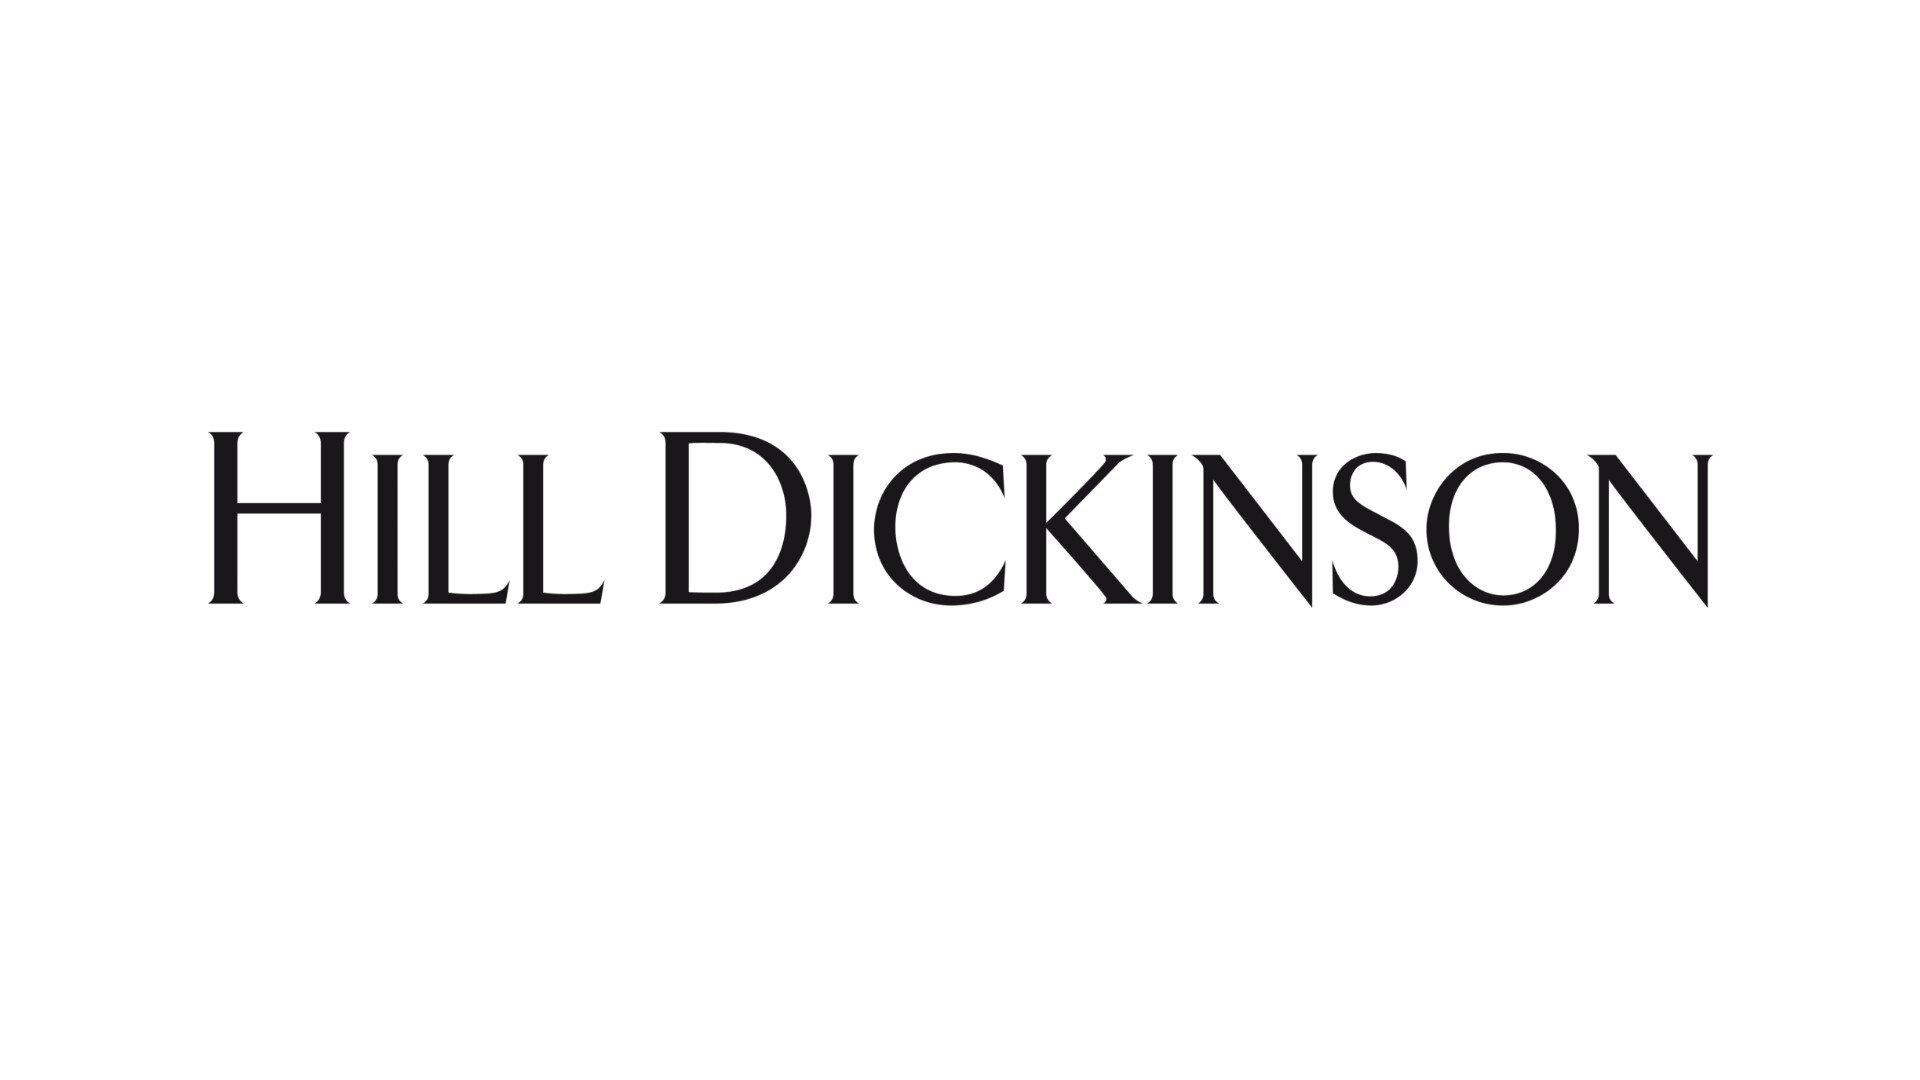 Hill Dickinson